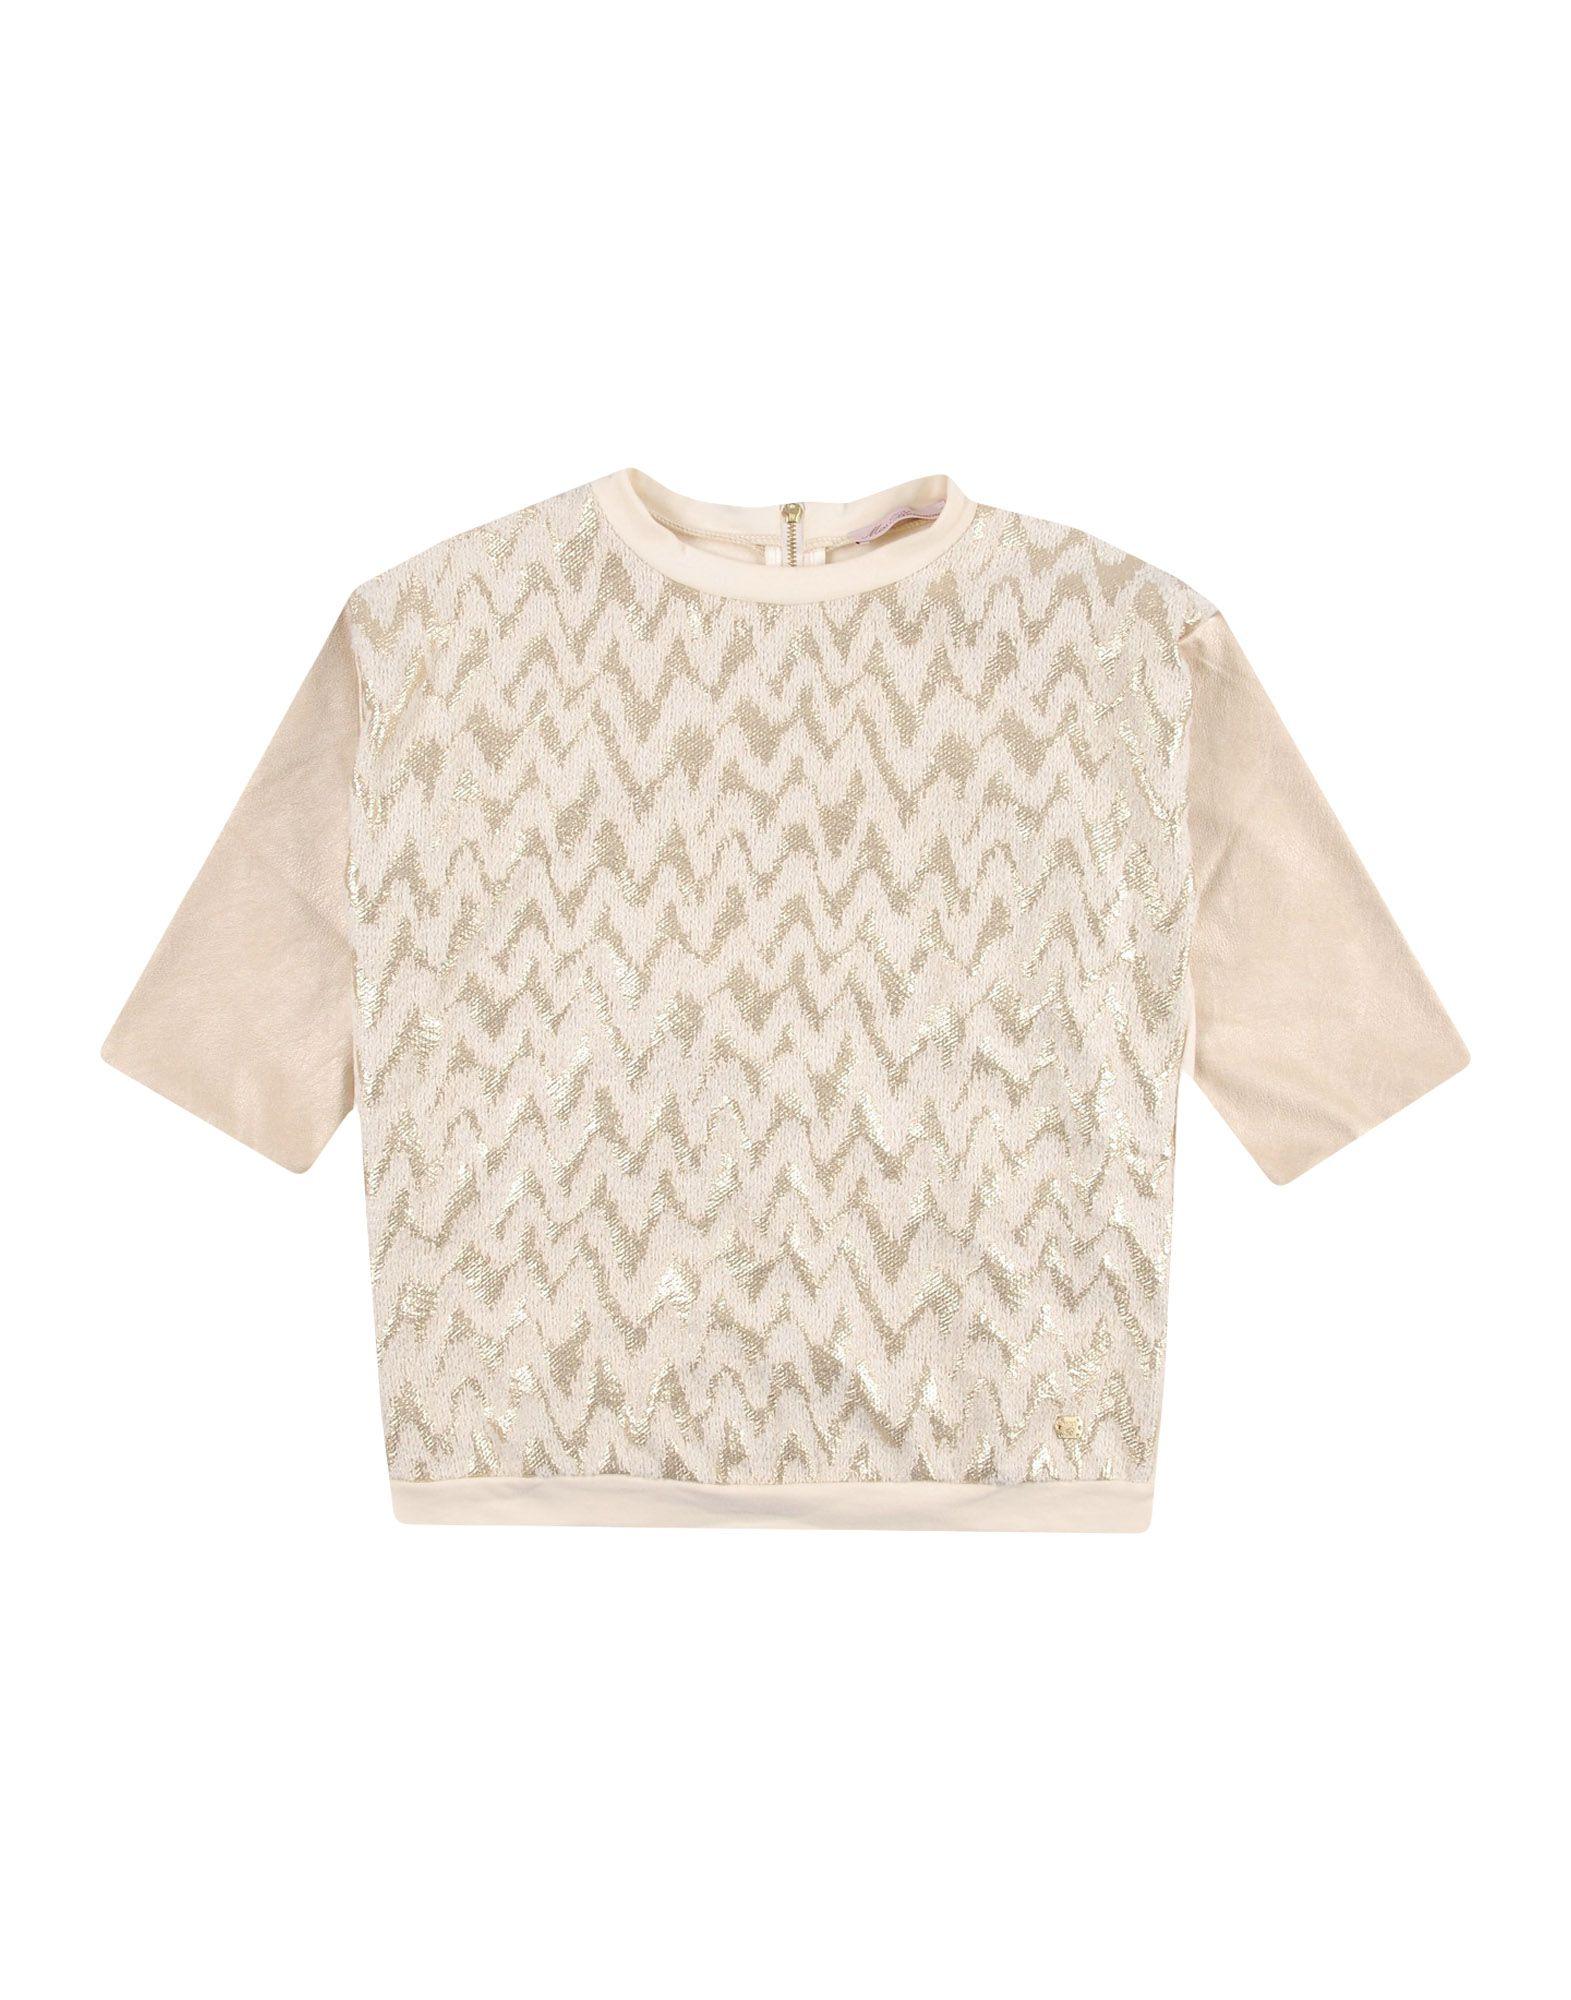 MISS BLUMARINE Sweatshirt in Beige